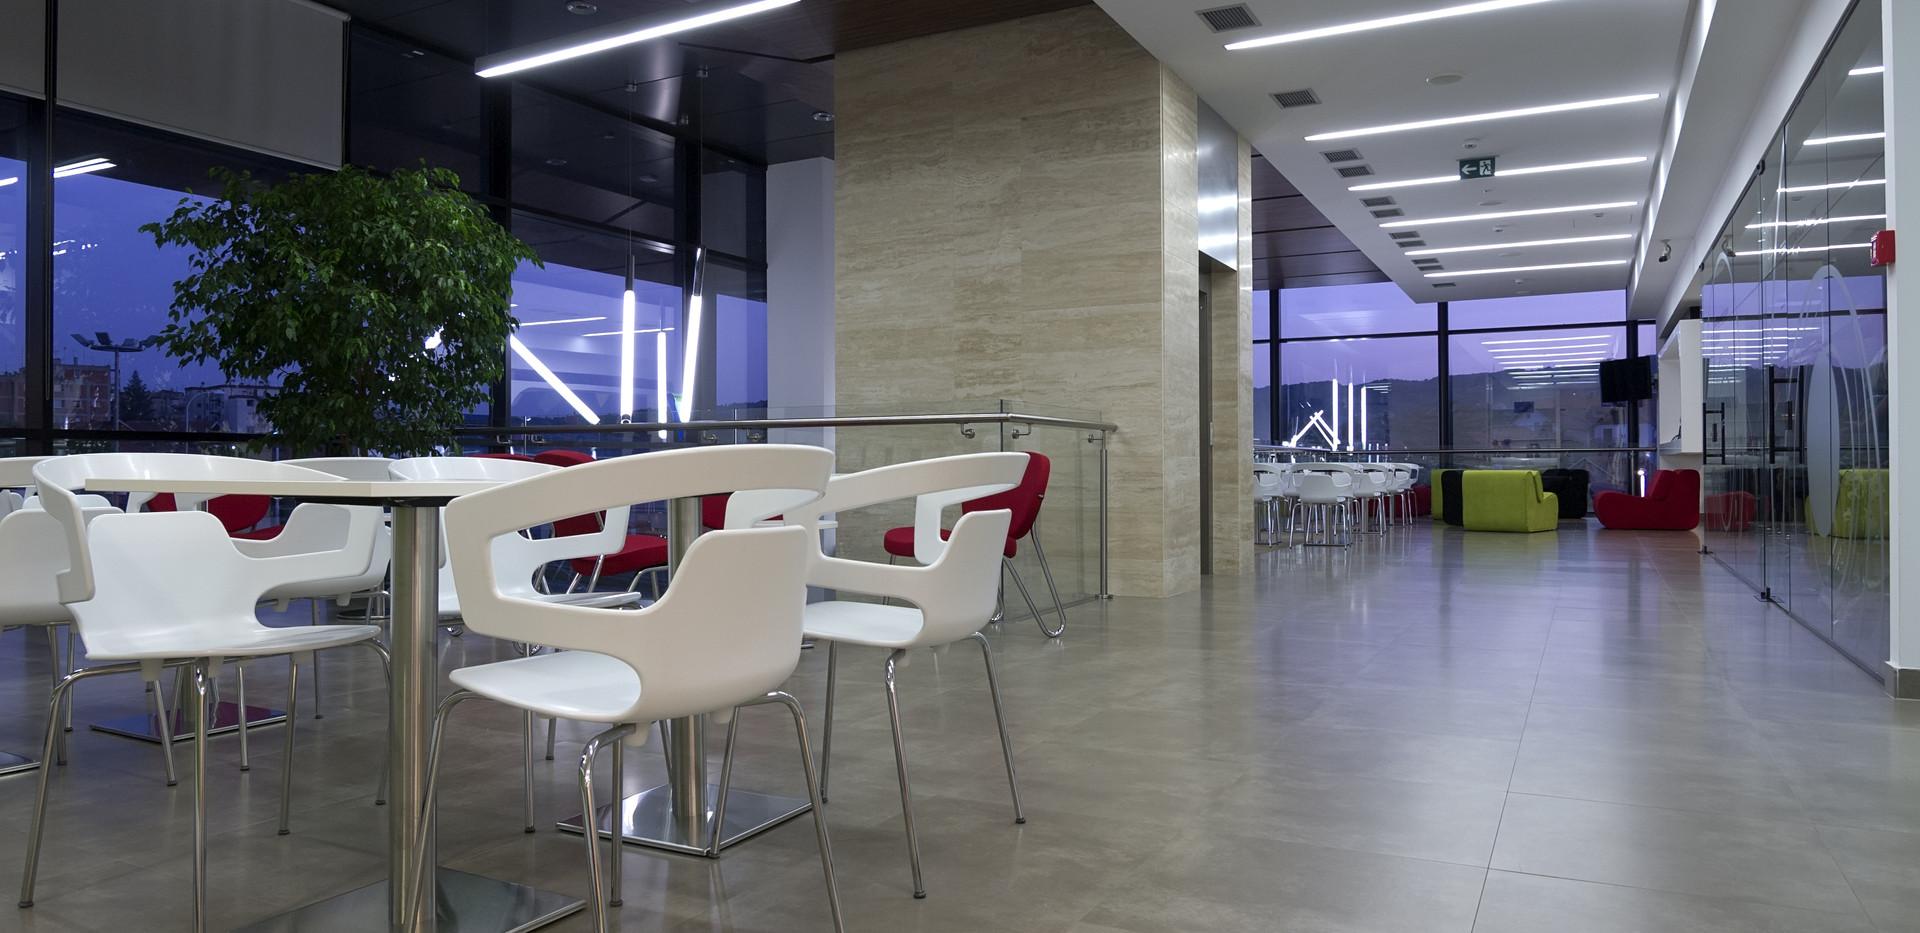 Business building cafe interior.jpg